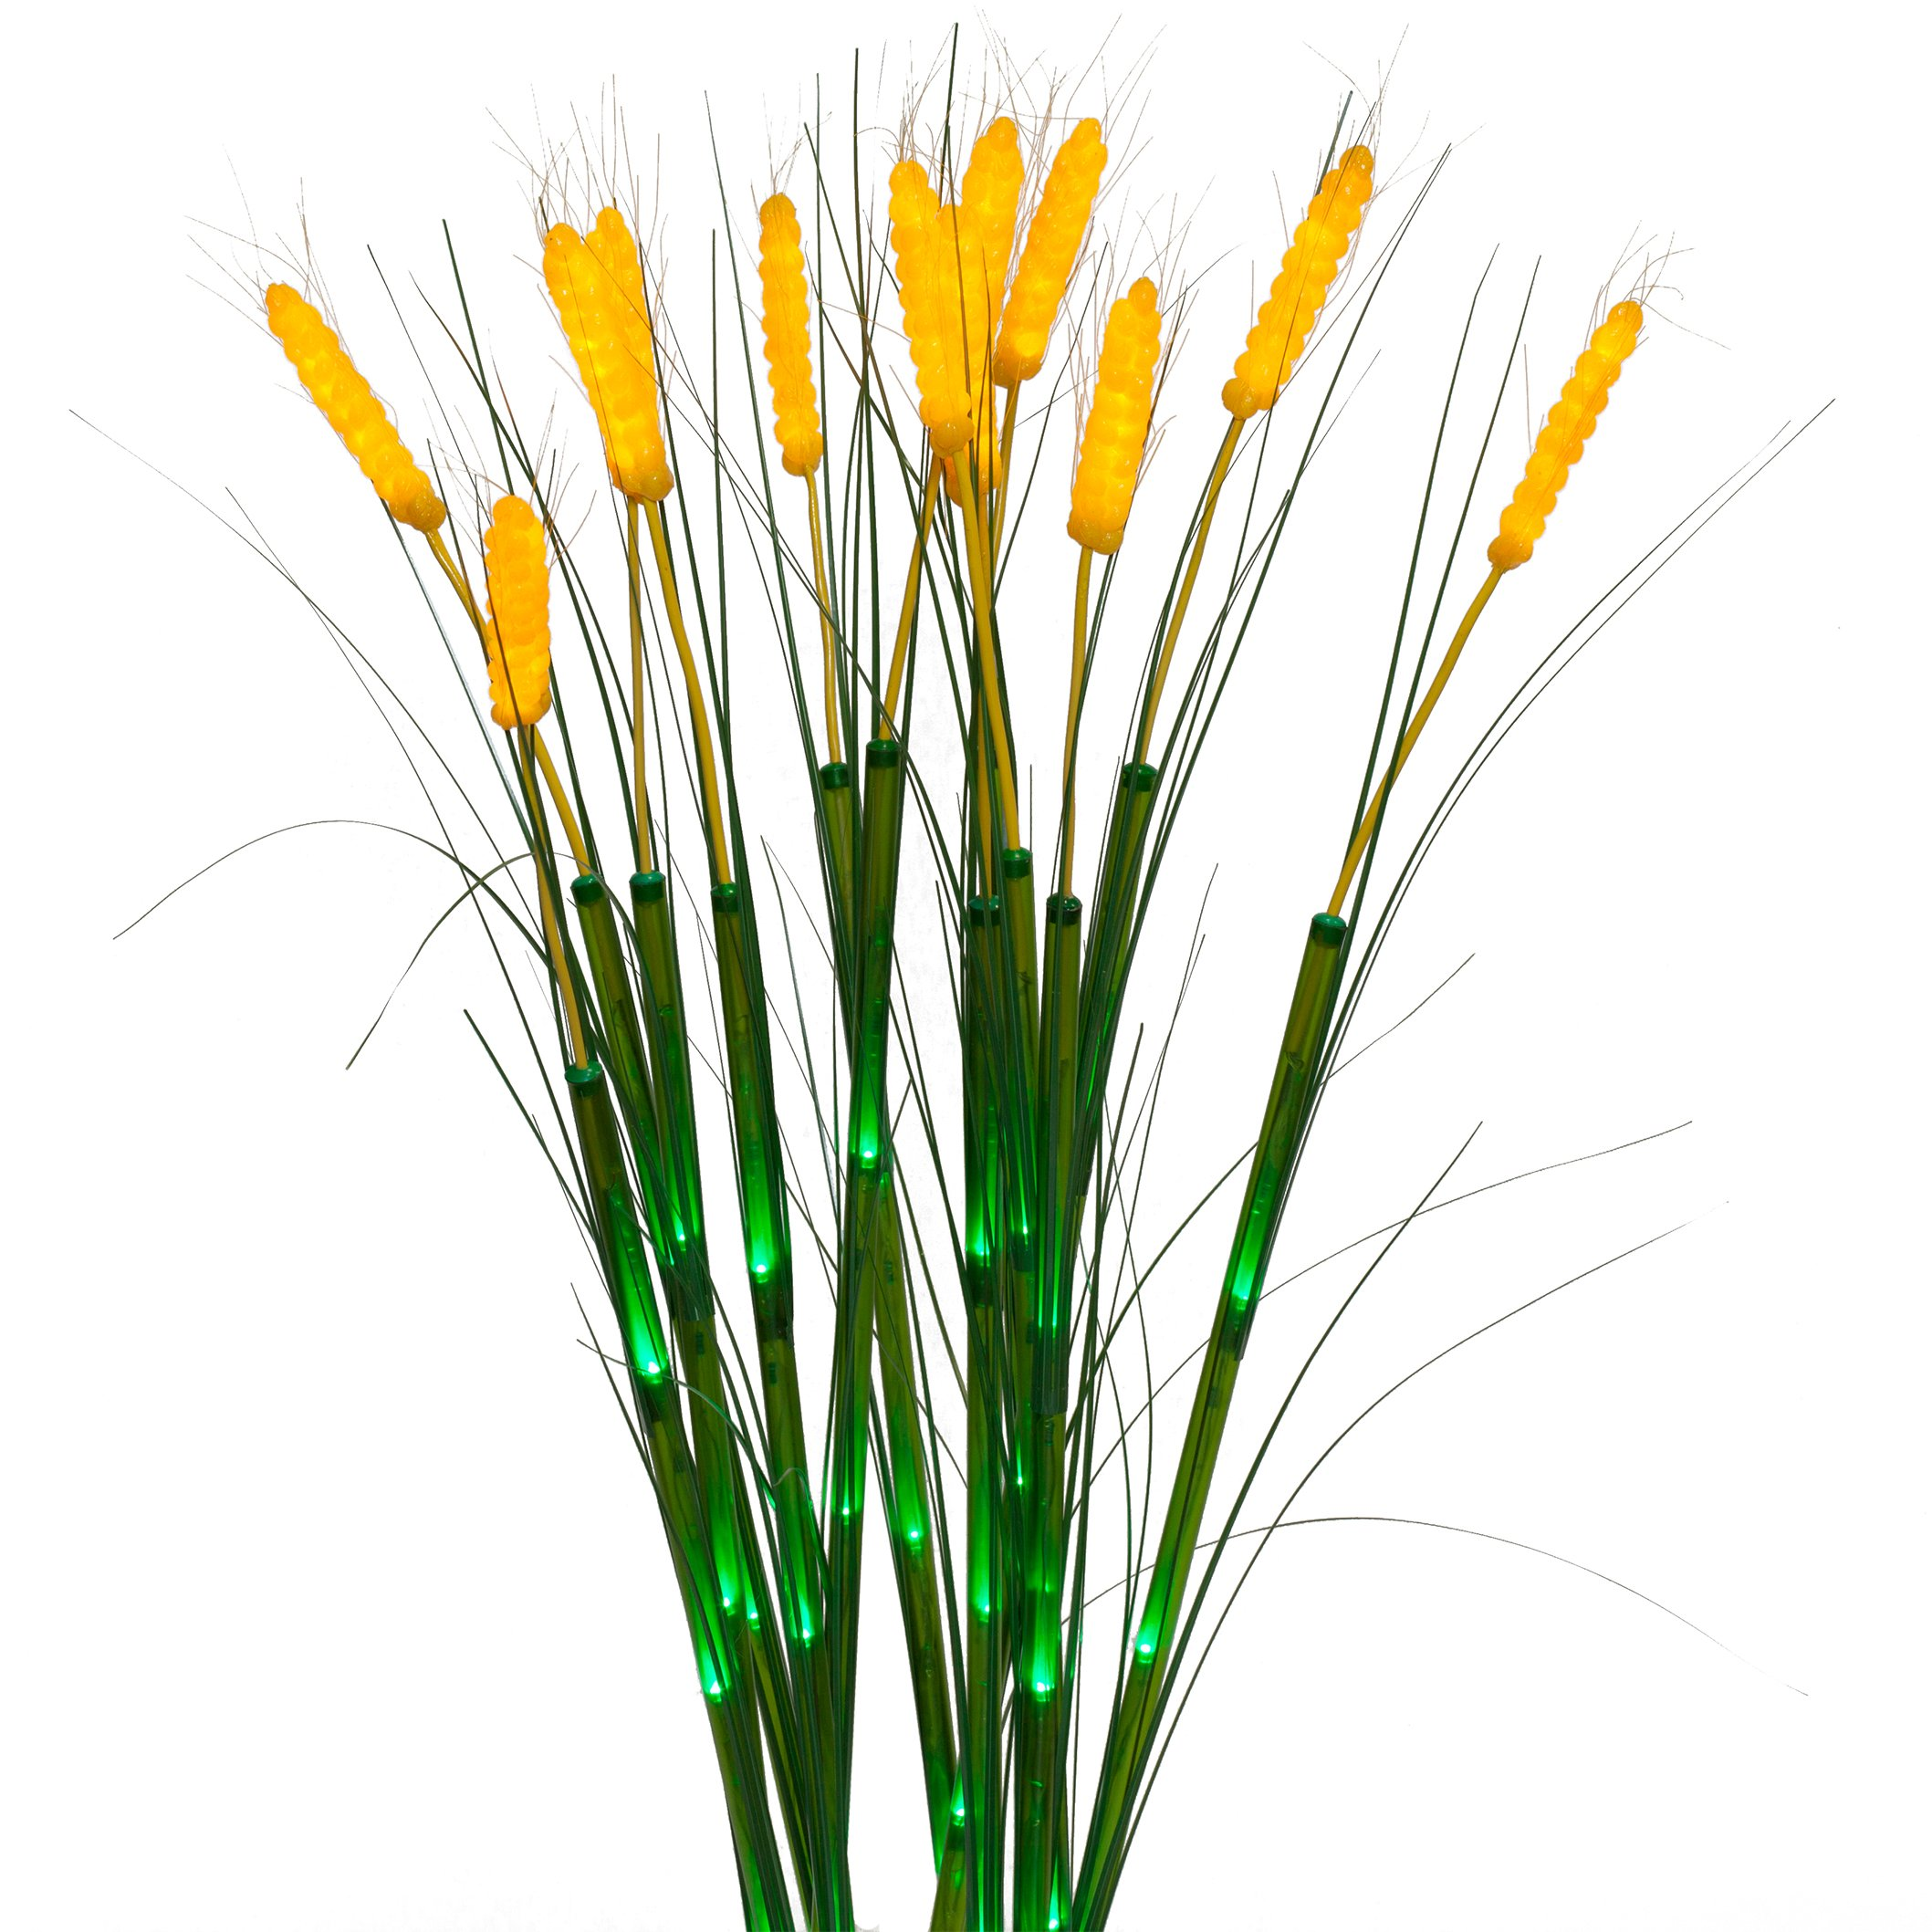 Wintergreen Lighting 41'' LED Wheat Stalks Wheat Home Décor, Lit Faux Wheat Stalks, Set of 12